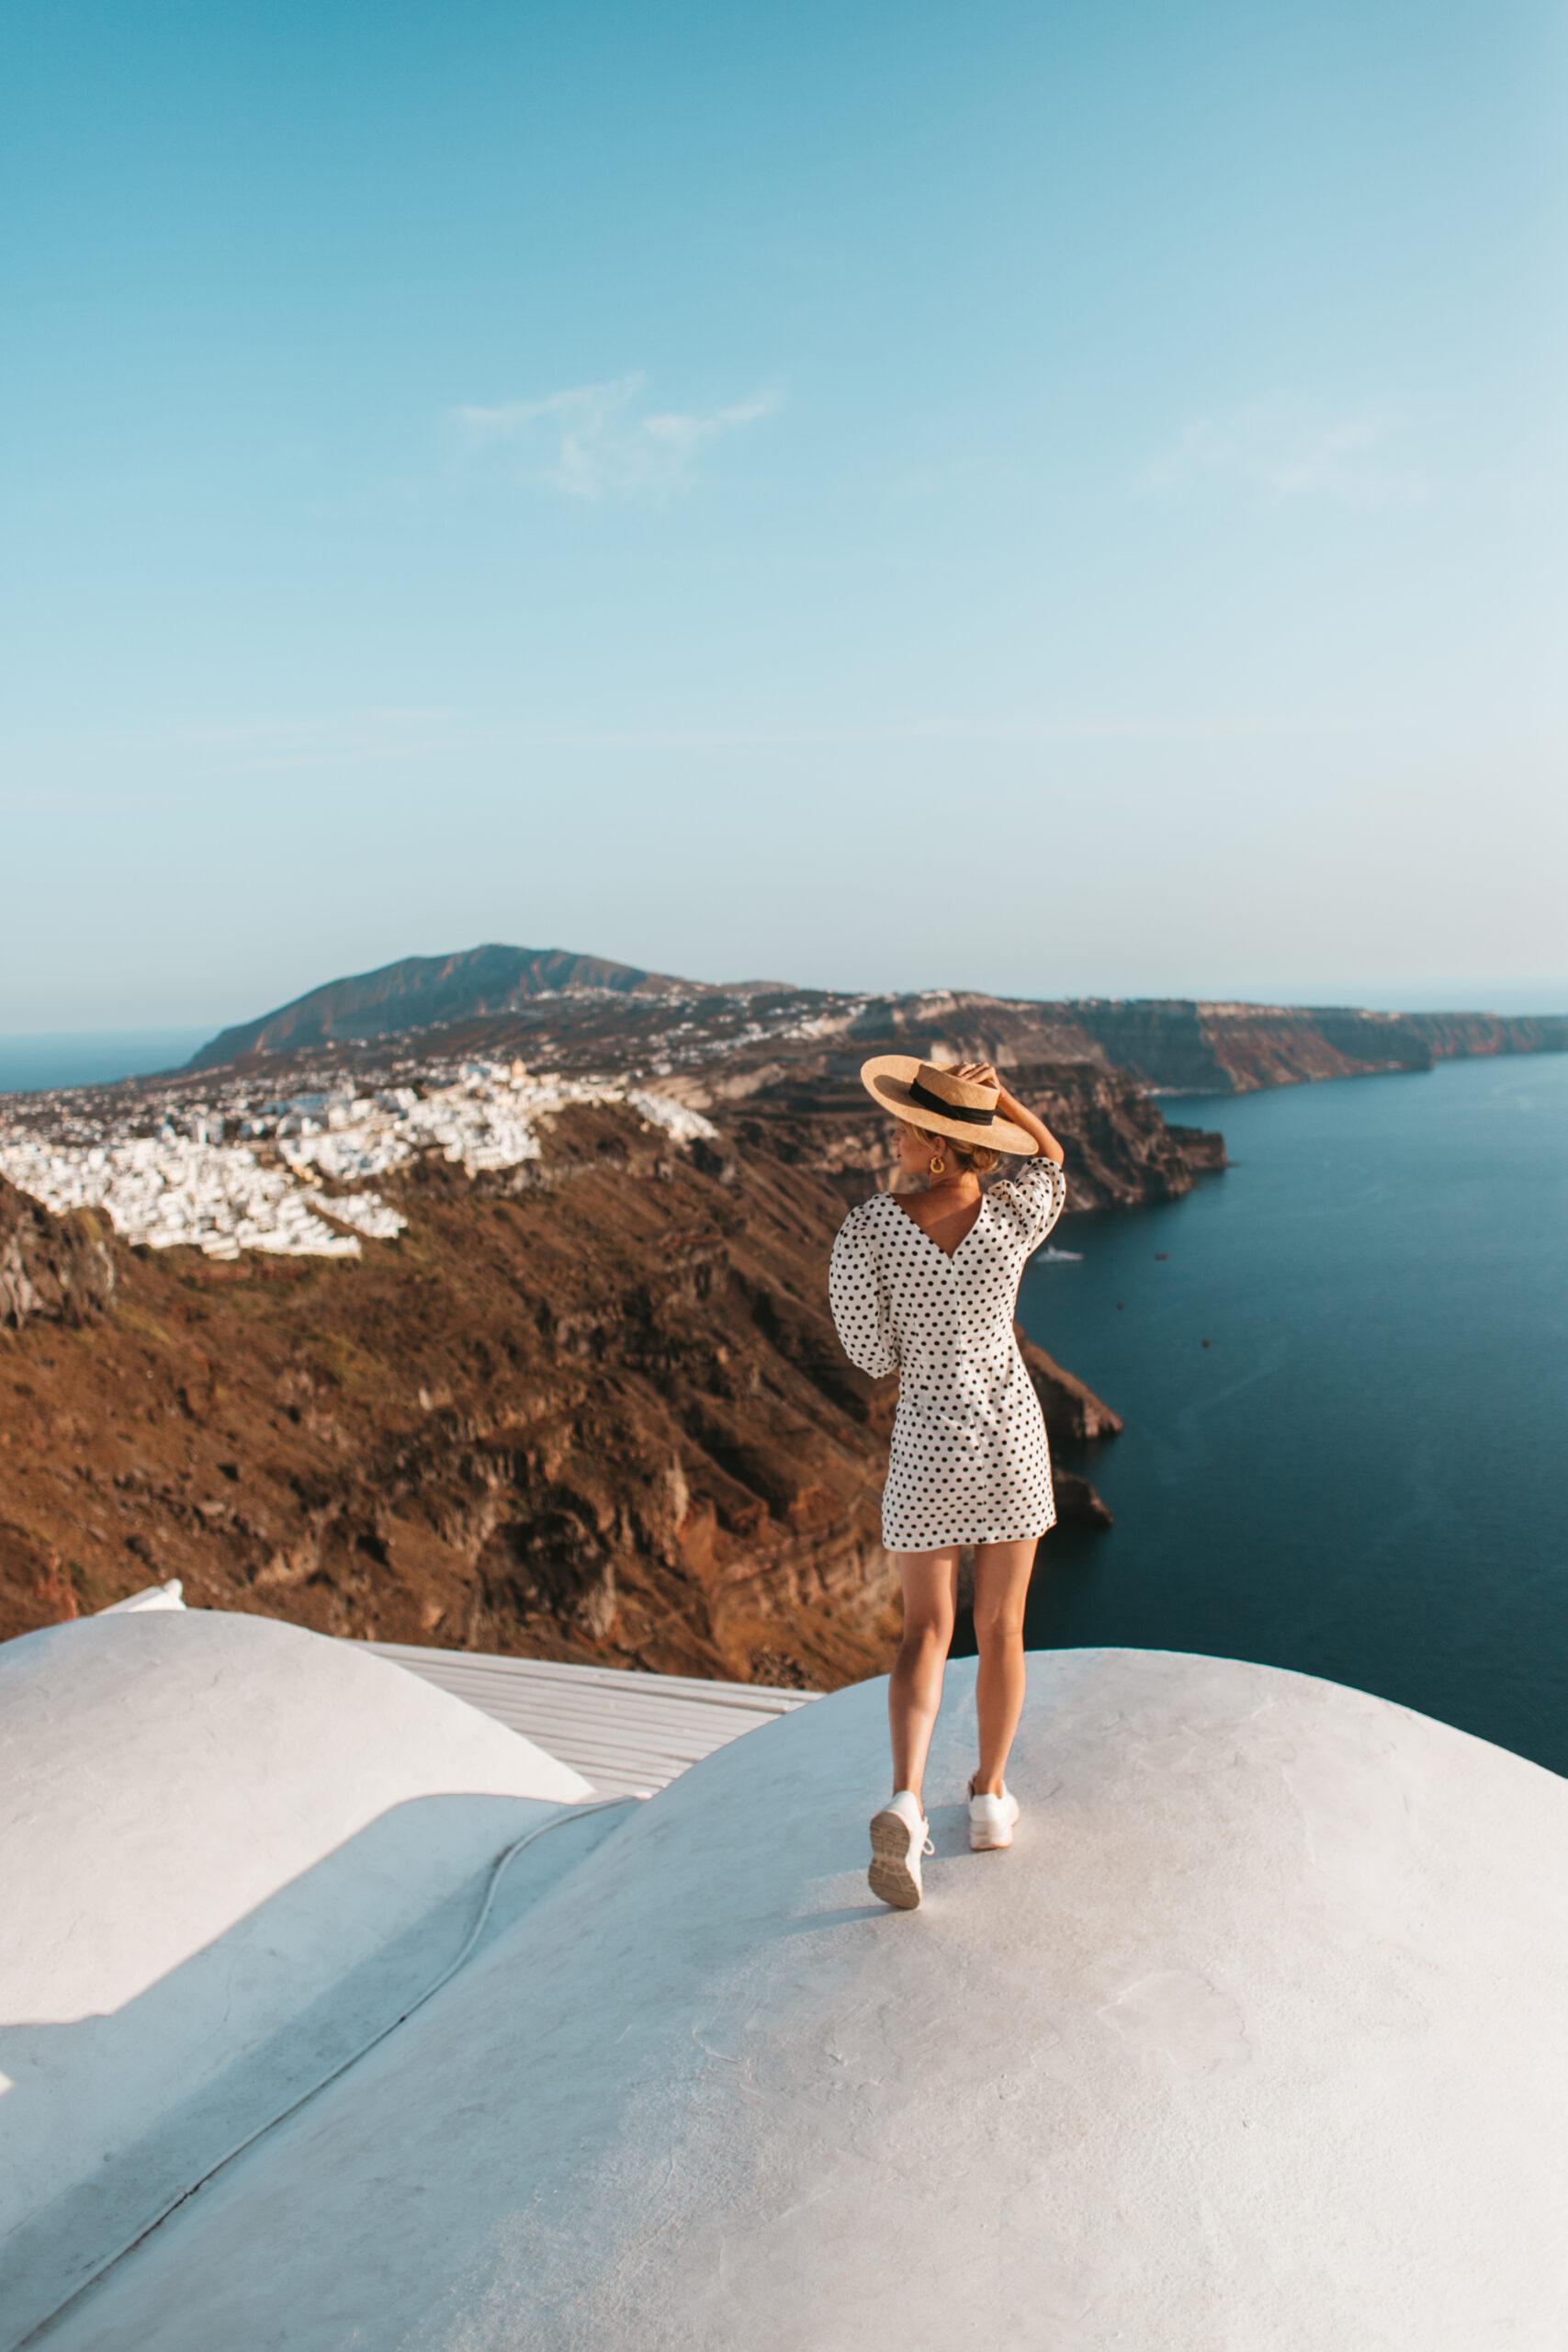 Blog Santorini, blogerka podróżnicza na dachu, widok na kalderę, Imerovigli